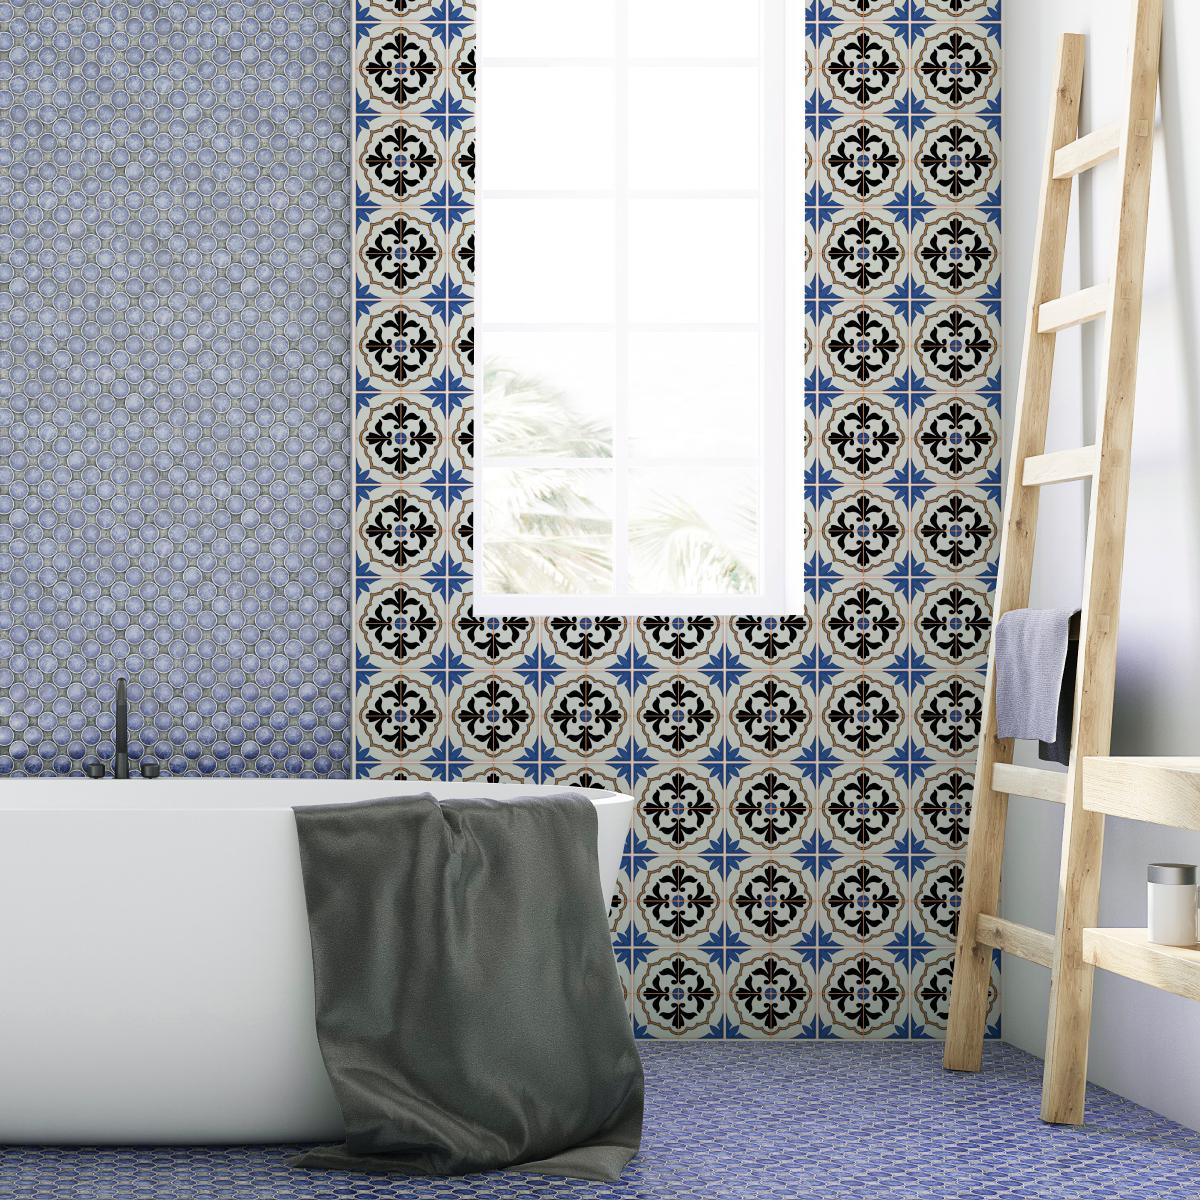 60 stickers carrelages azulejos joao salle de bain et wc salle de bain ambiance sticker. Black Bedroom Furniture Sets. Home Design Ideas